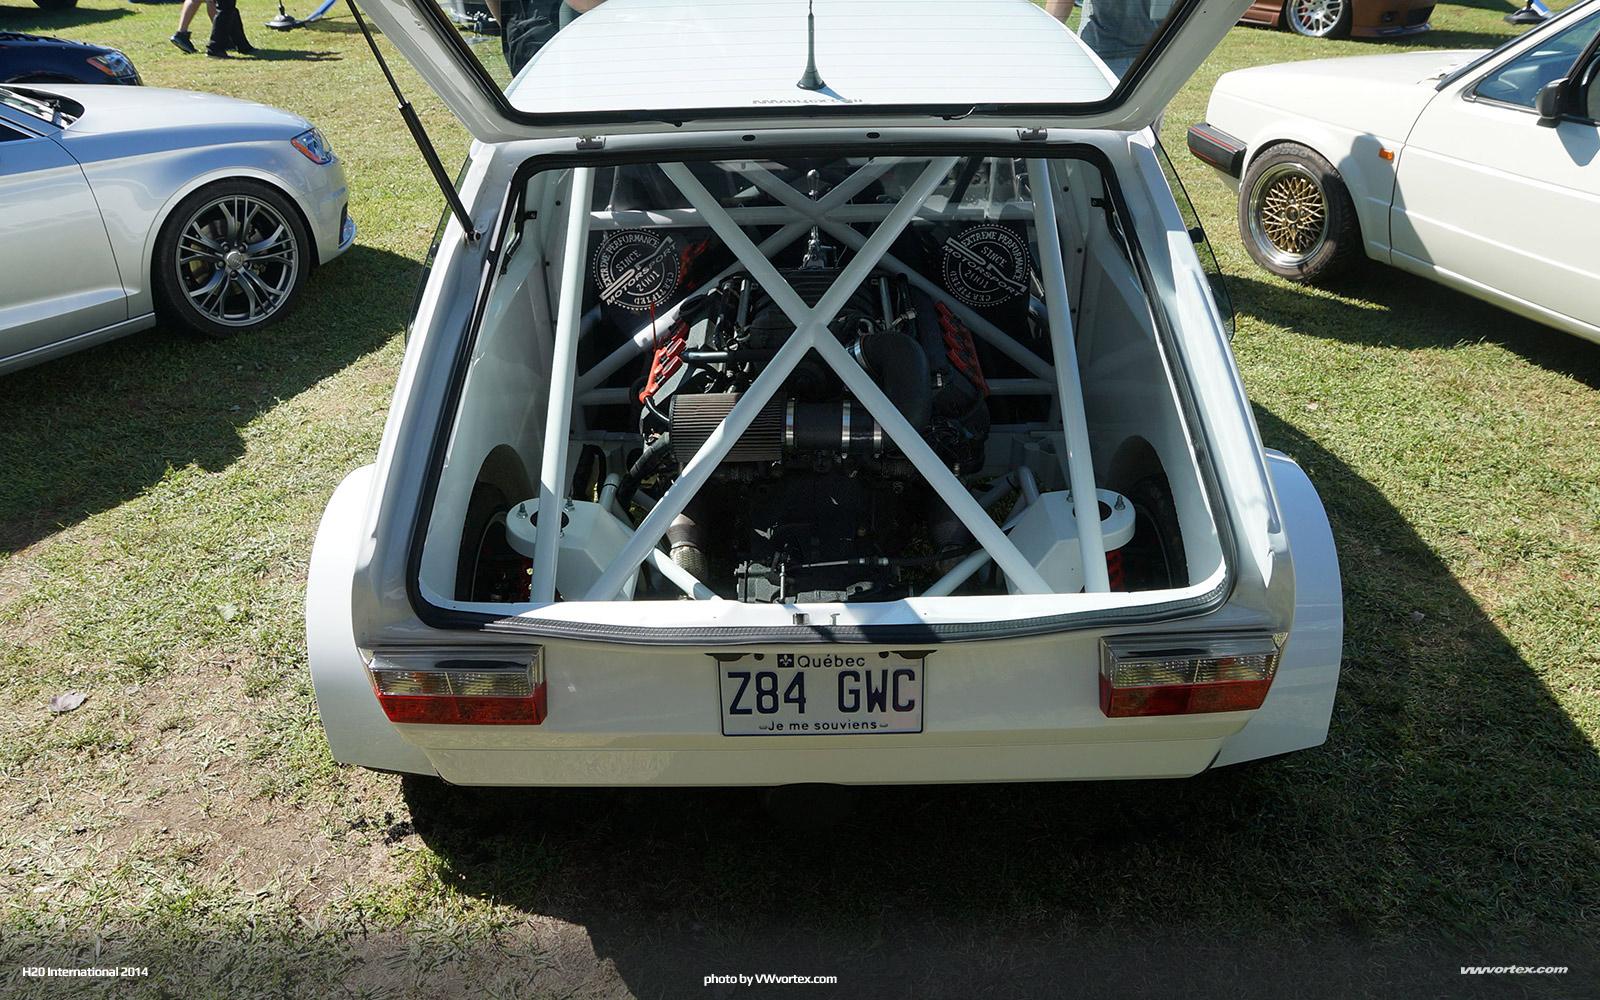 2014-H20i-H20-International-VW-Volkswagen-Audi-1170